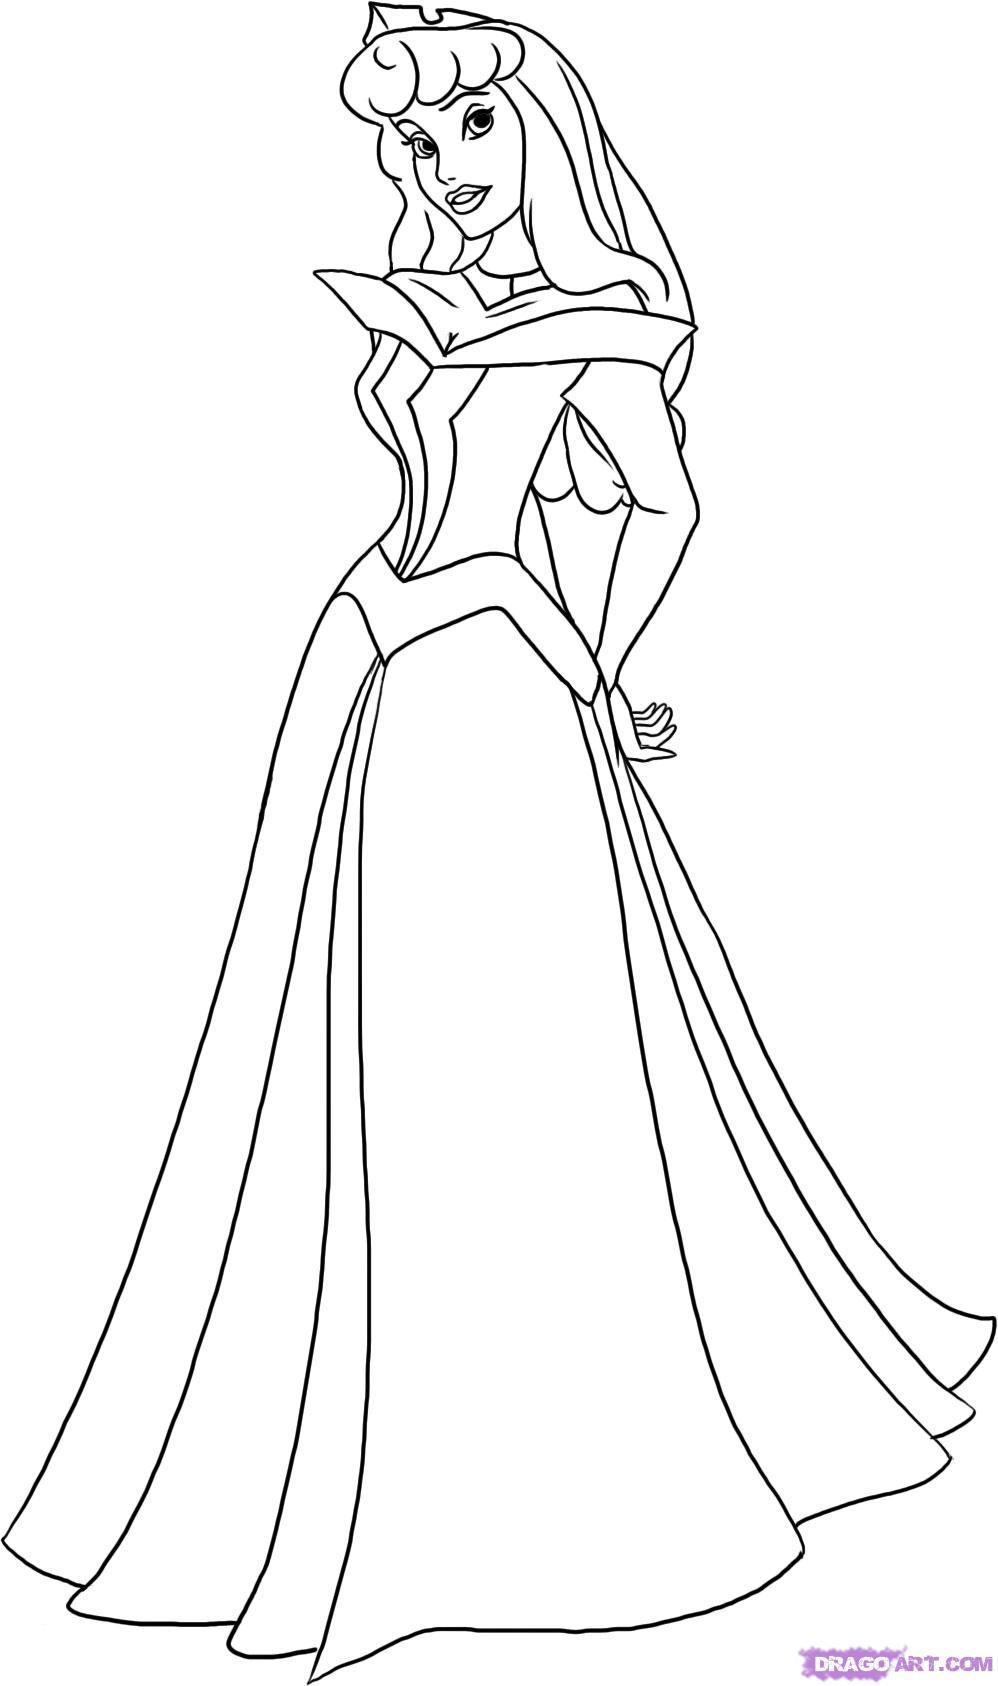 how to draw sleeping beauty, princess aurora step 5